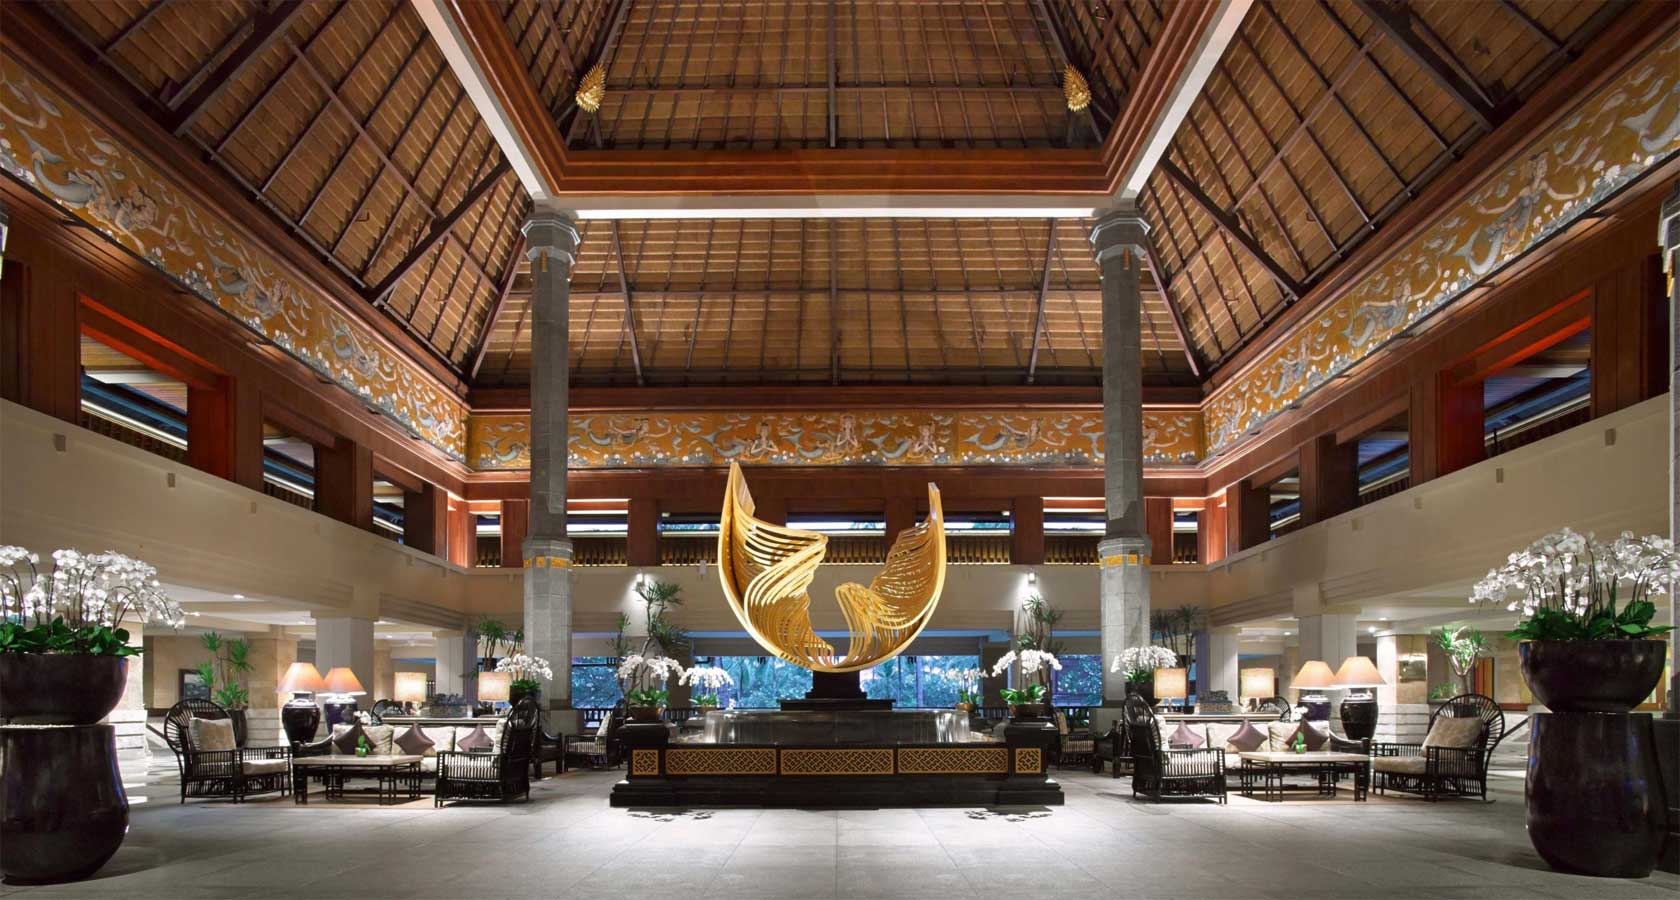 INTERCONTINENTAL BALI RESORT lobby area